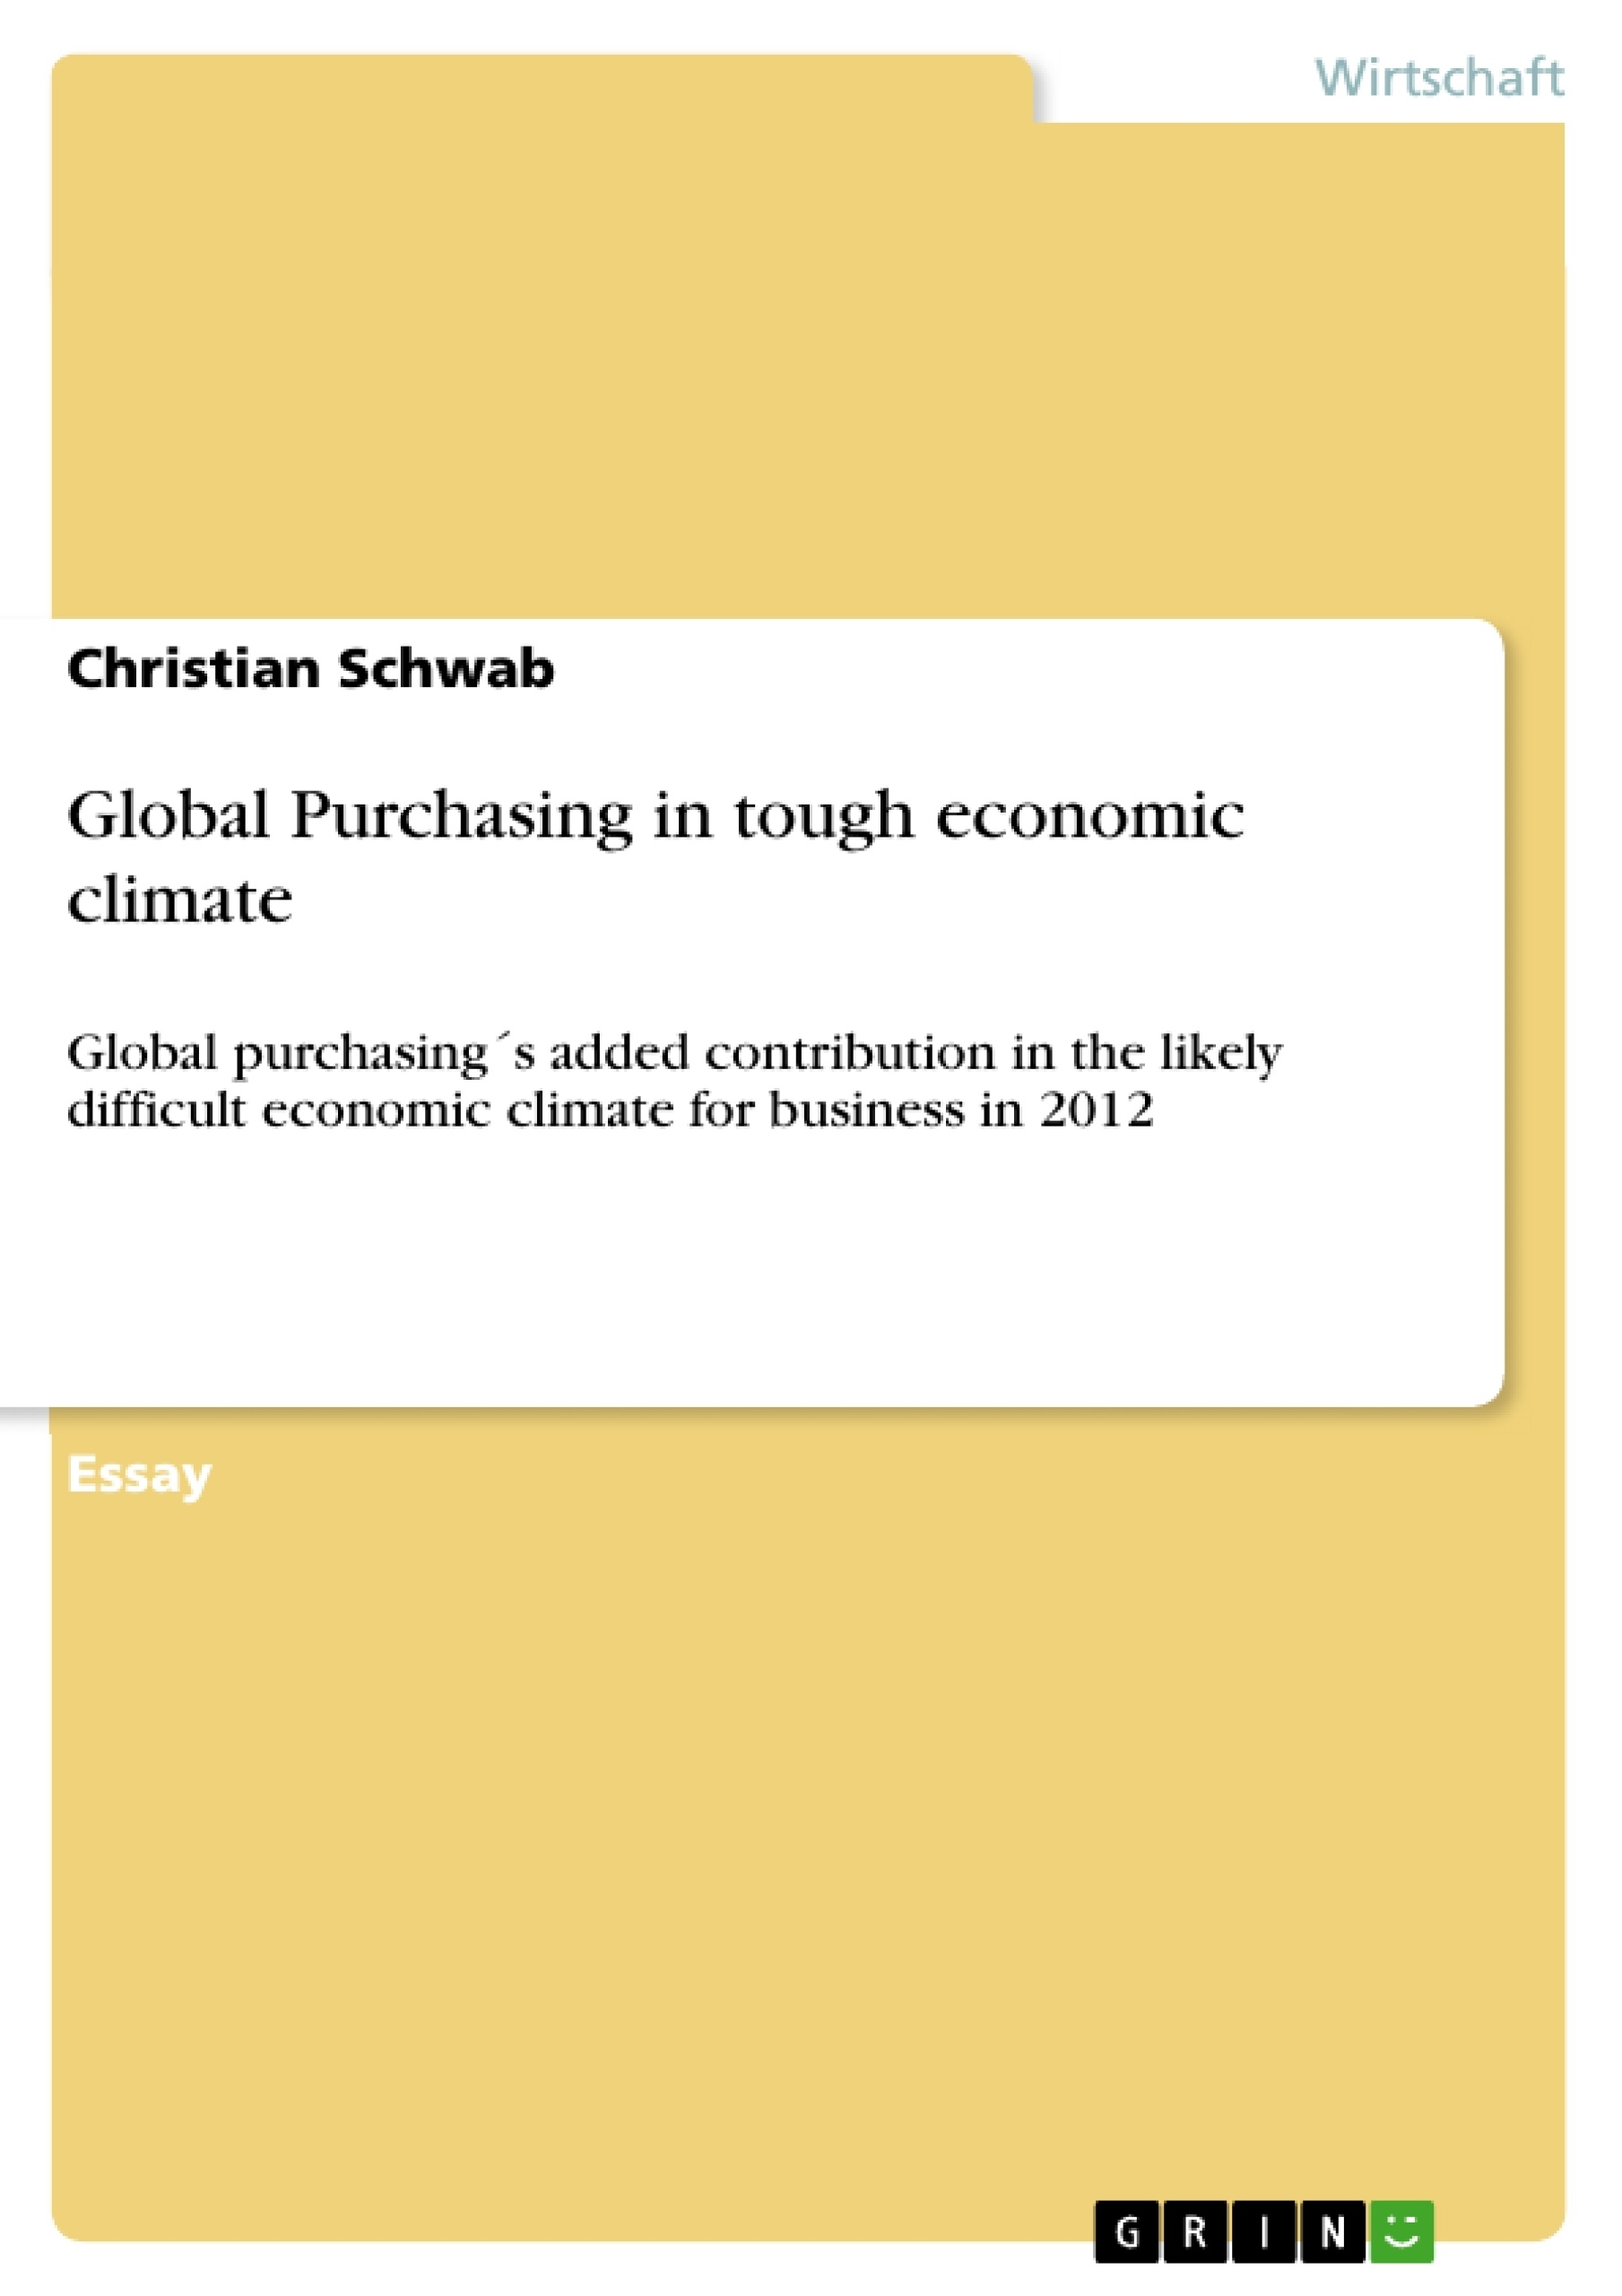 Titel: Global Purchasing in tough economic climate